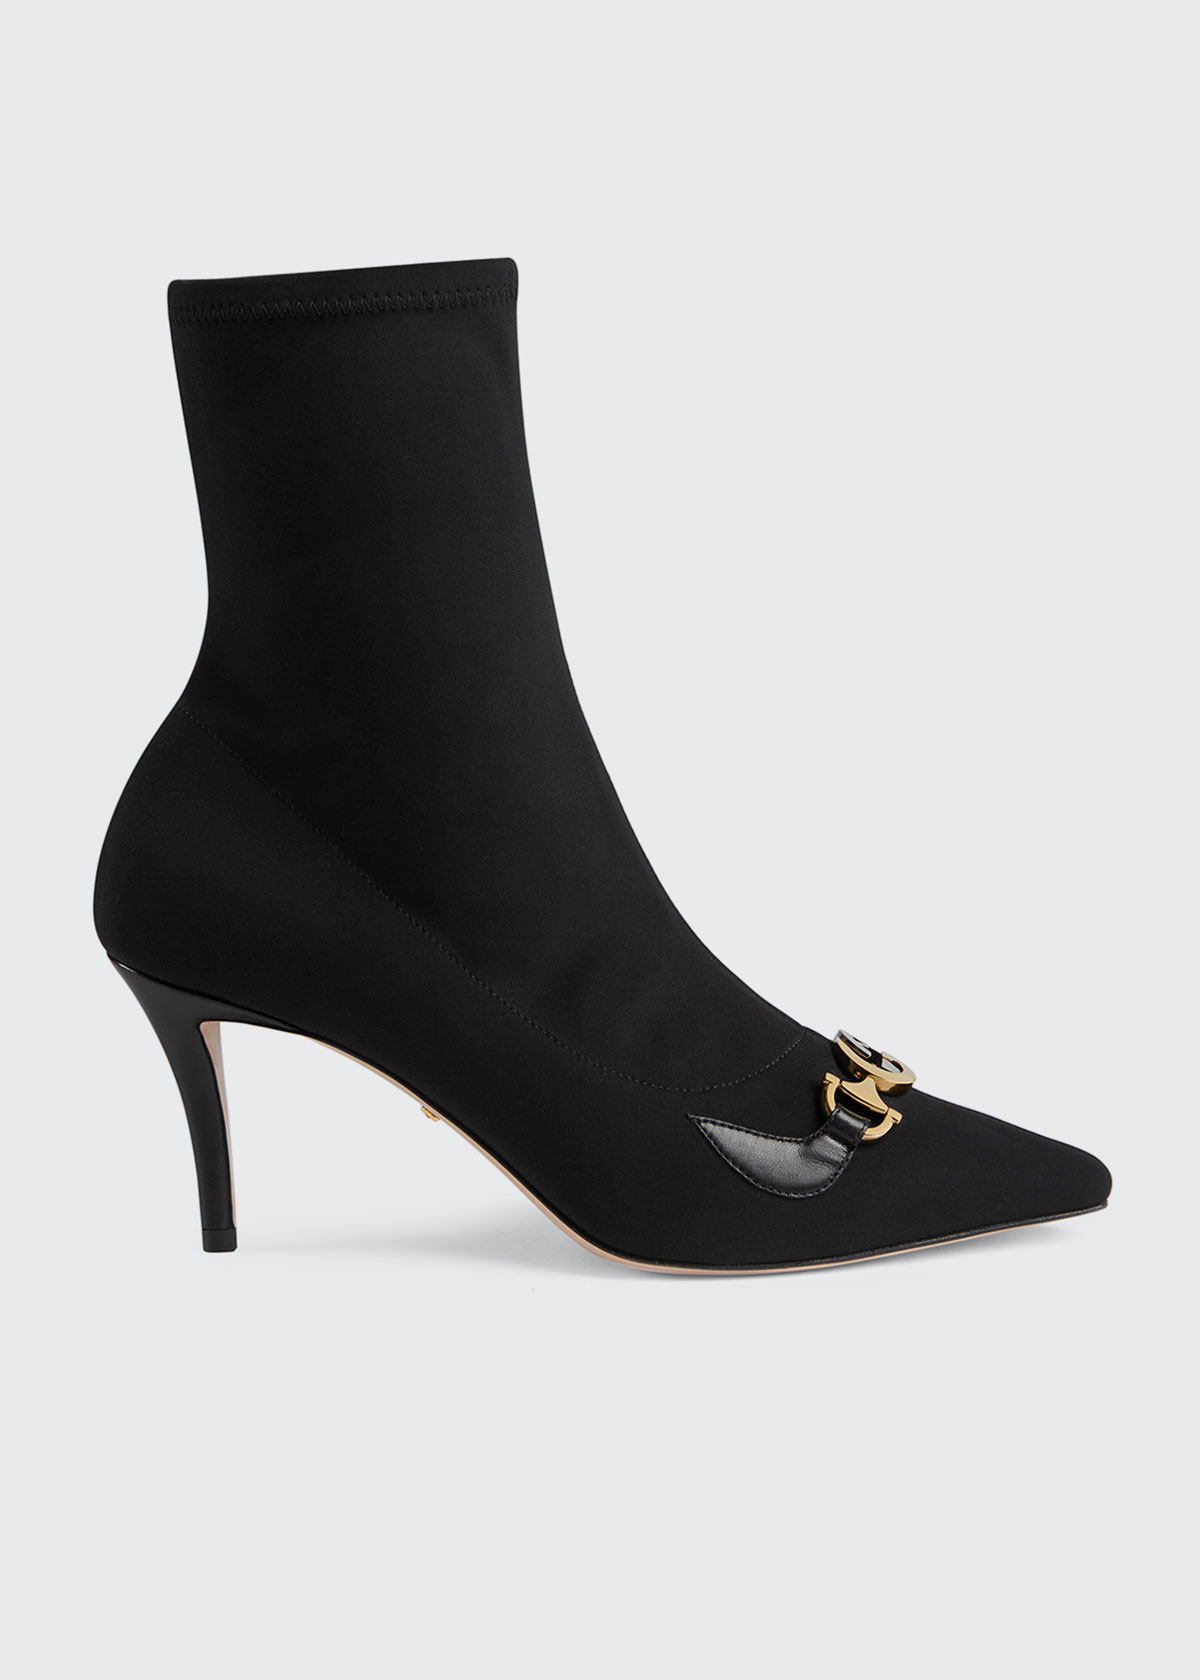 Gucci Boots ZUMI 75MM STRETCH BOOTIES